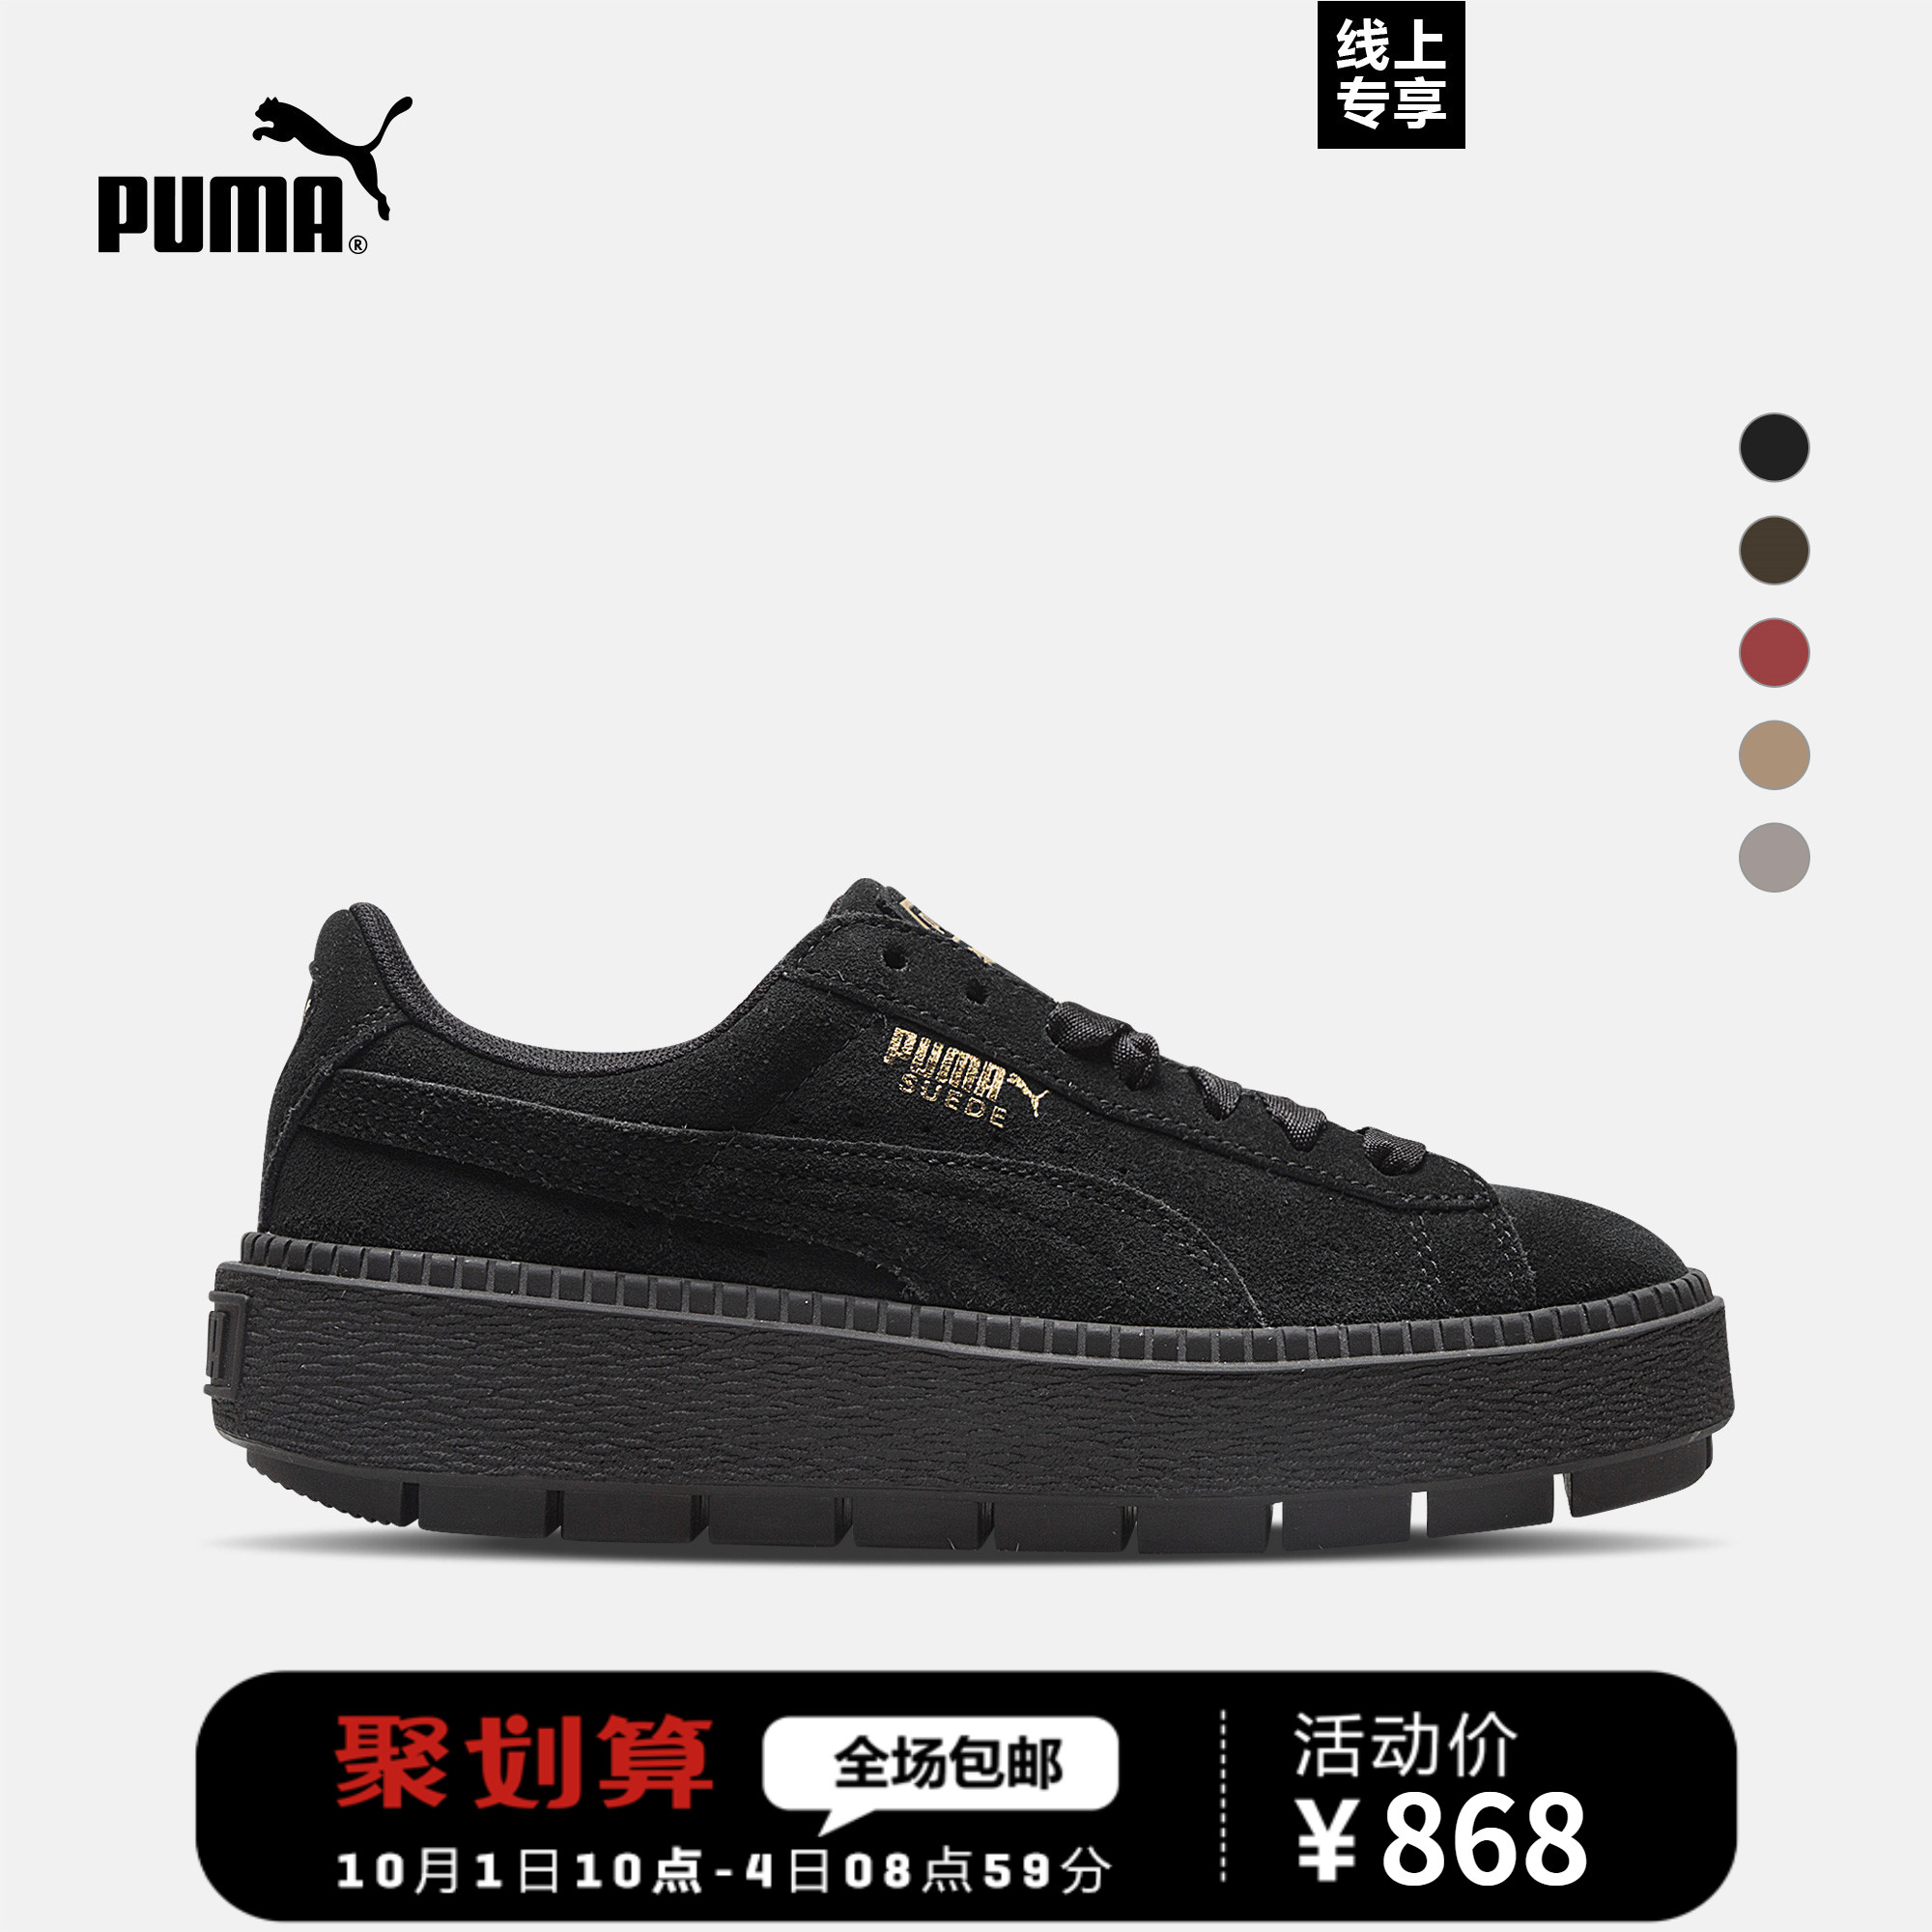 PUMA彪马官方 女子厚底休闲鞋 SUEDE Platform Trace 365830